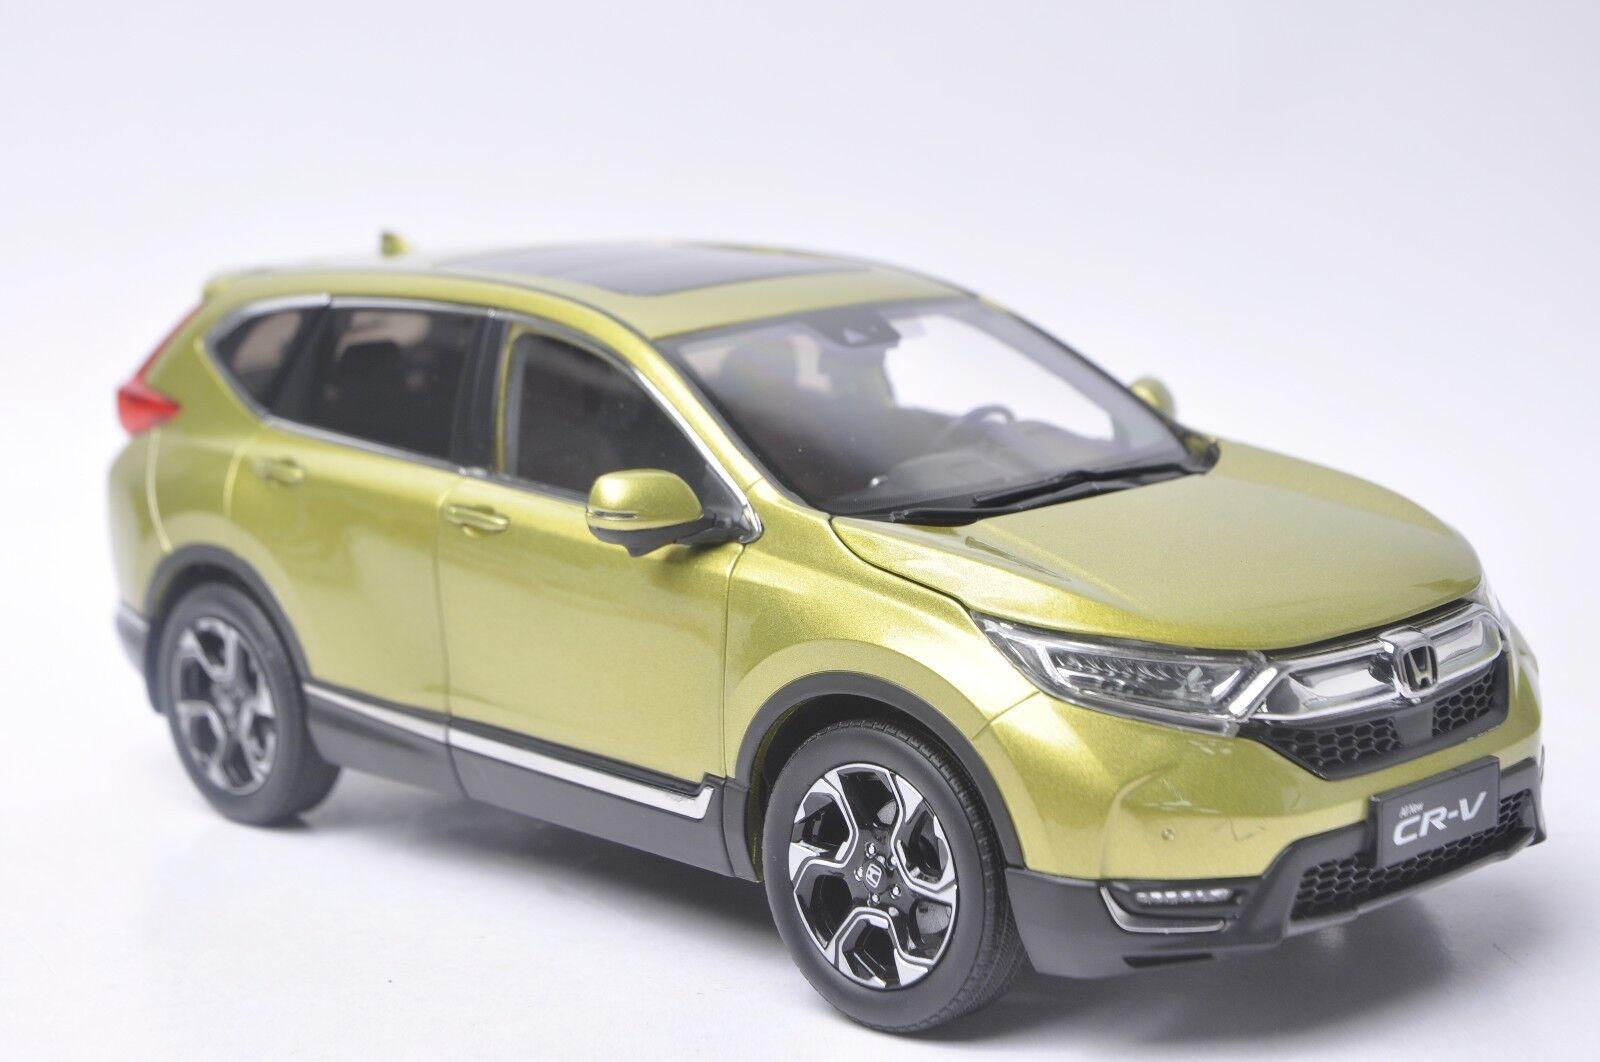 Honda CR-V 2017 SUV model in scale 1 18 yellow